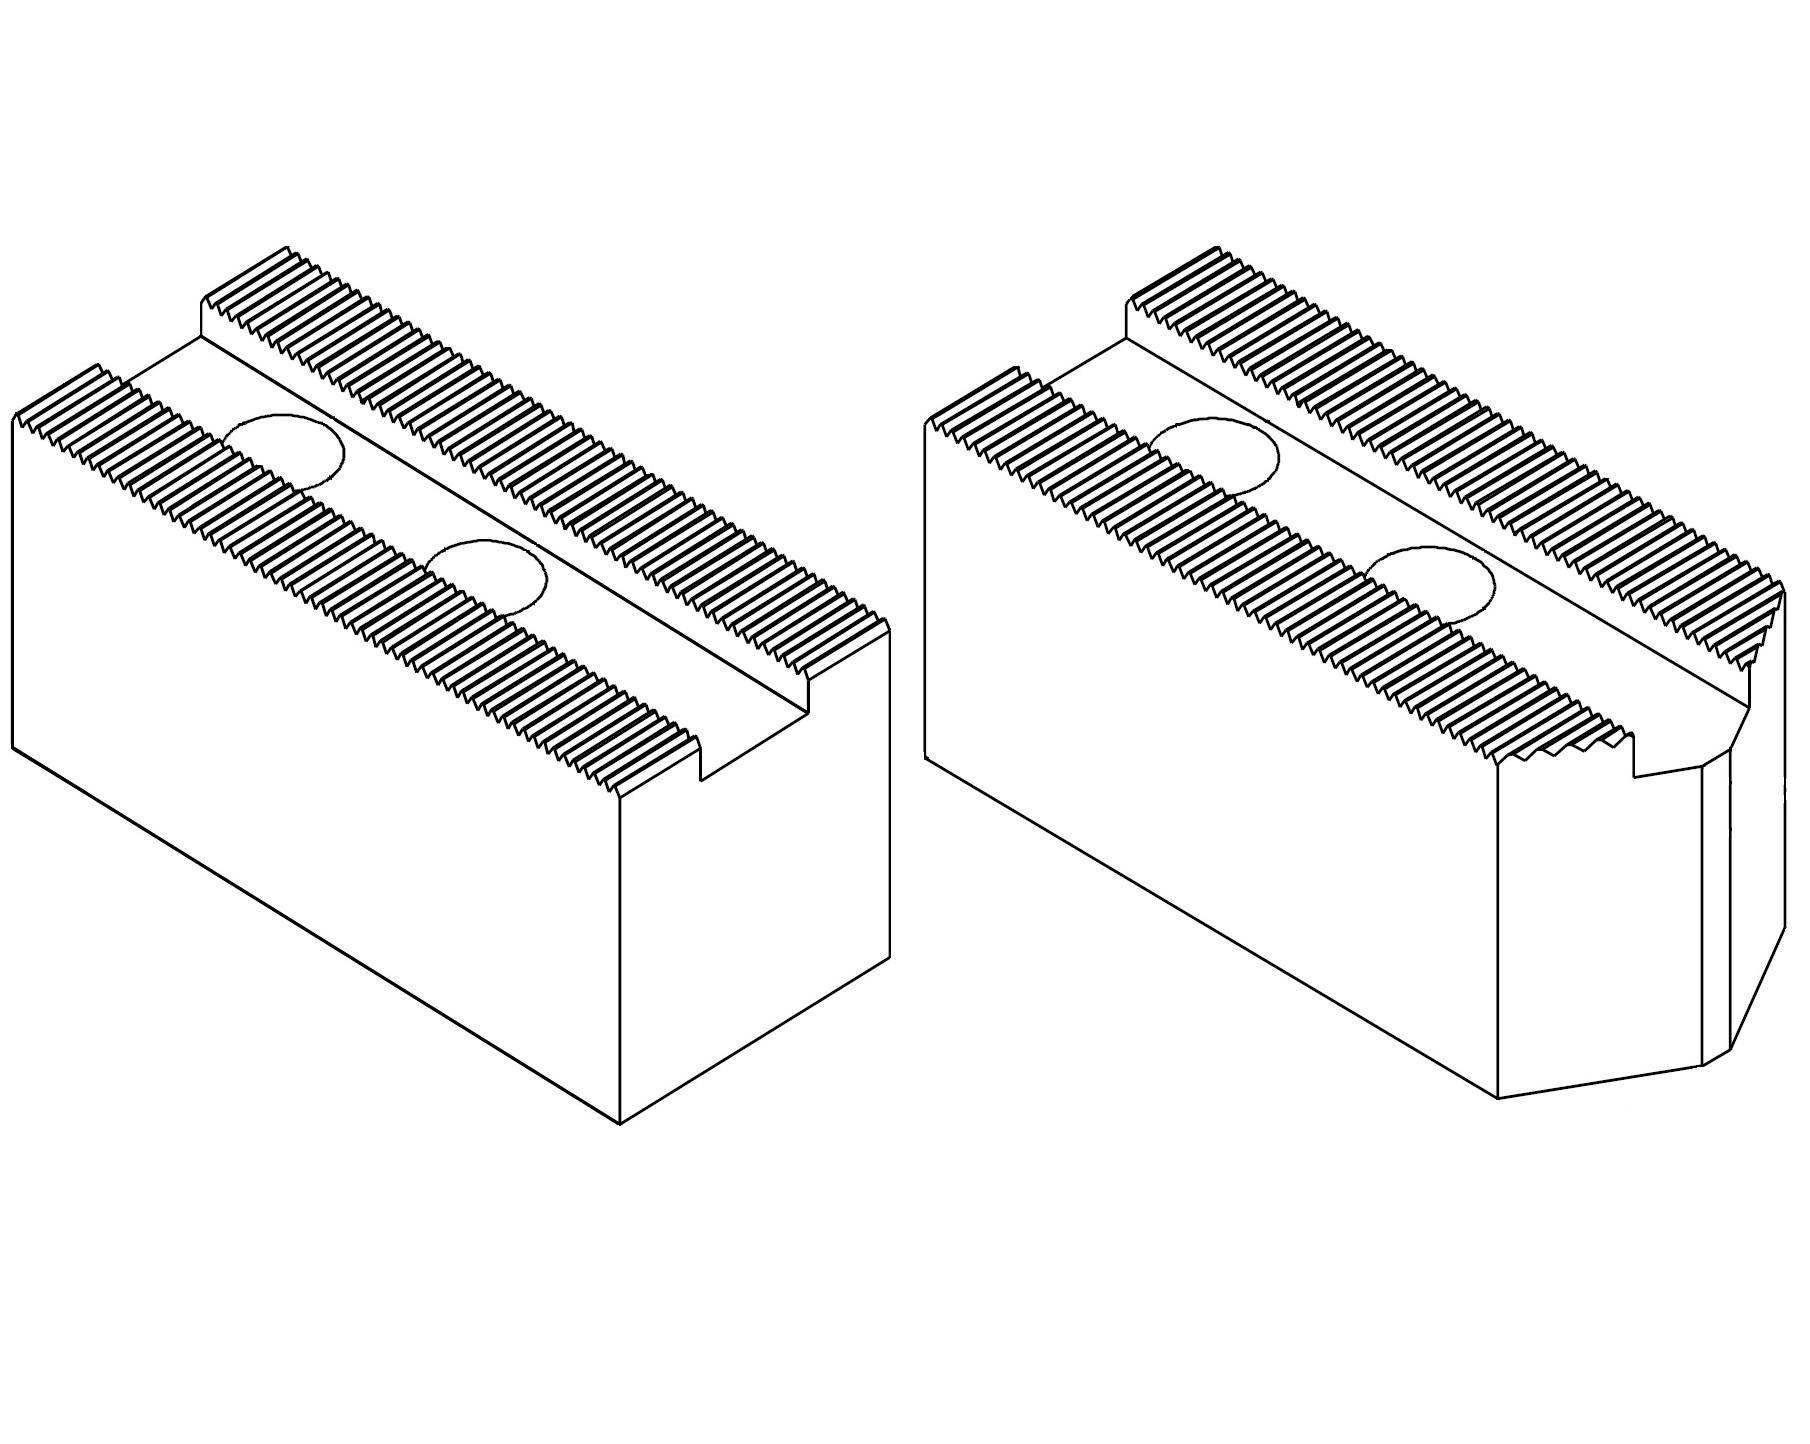 "Čelisti měkké 3/32""x90°, šířka drážky - 25,5 (sklíčidla pr. 400 - 800 mm)"